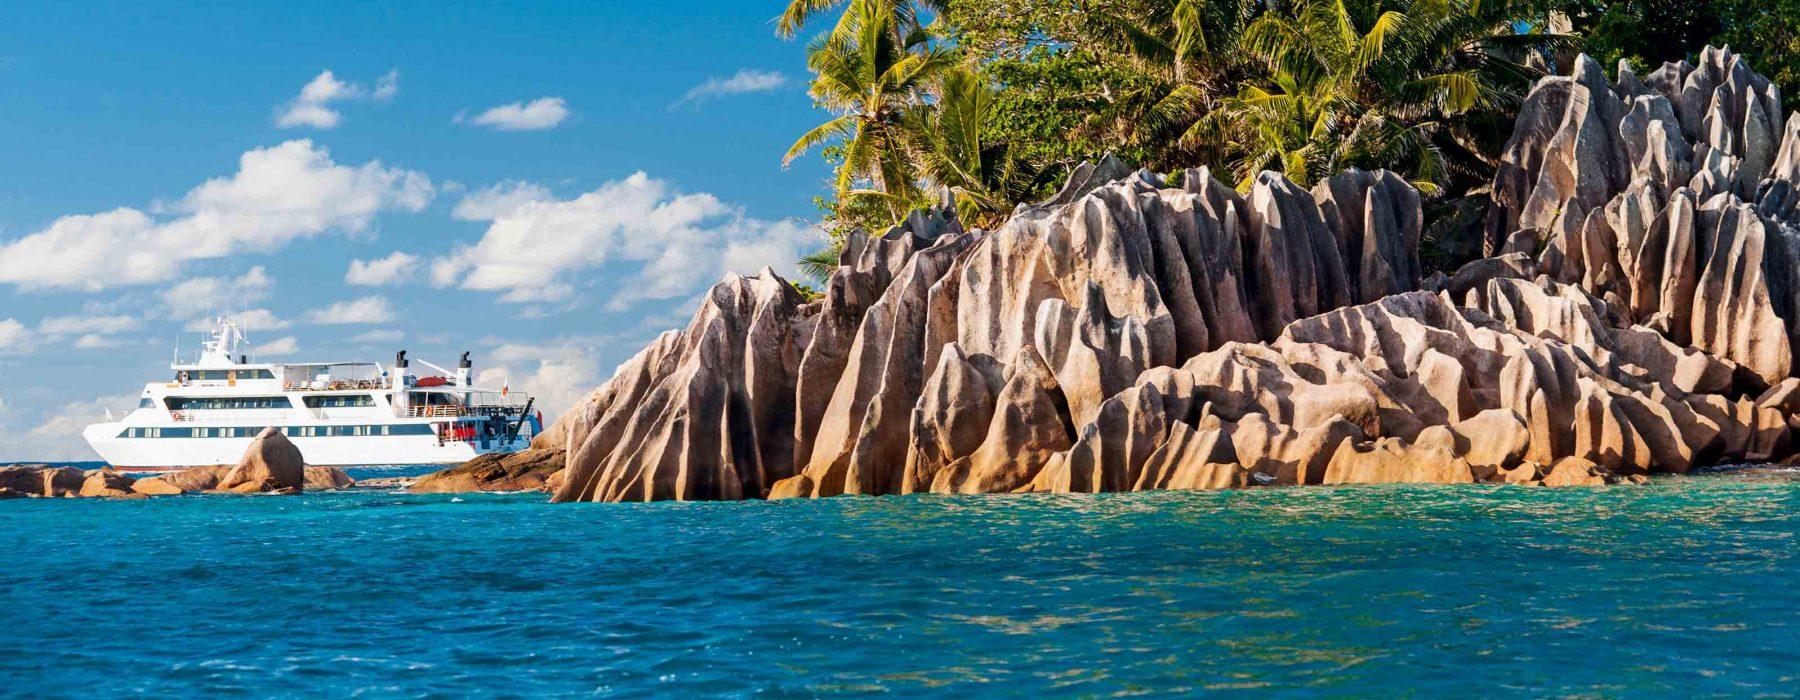 Cruzeiro nas Seychelles